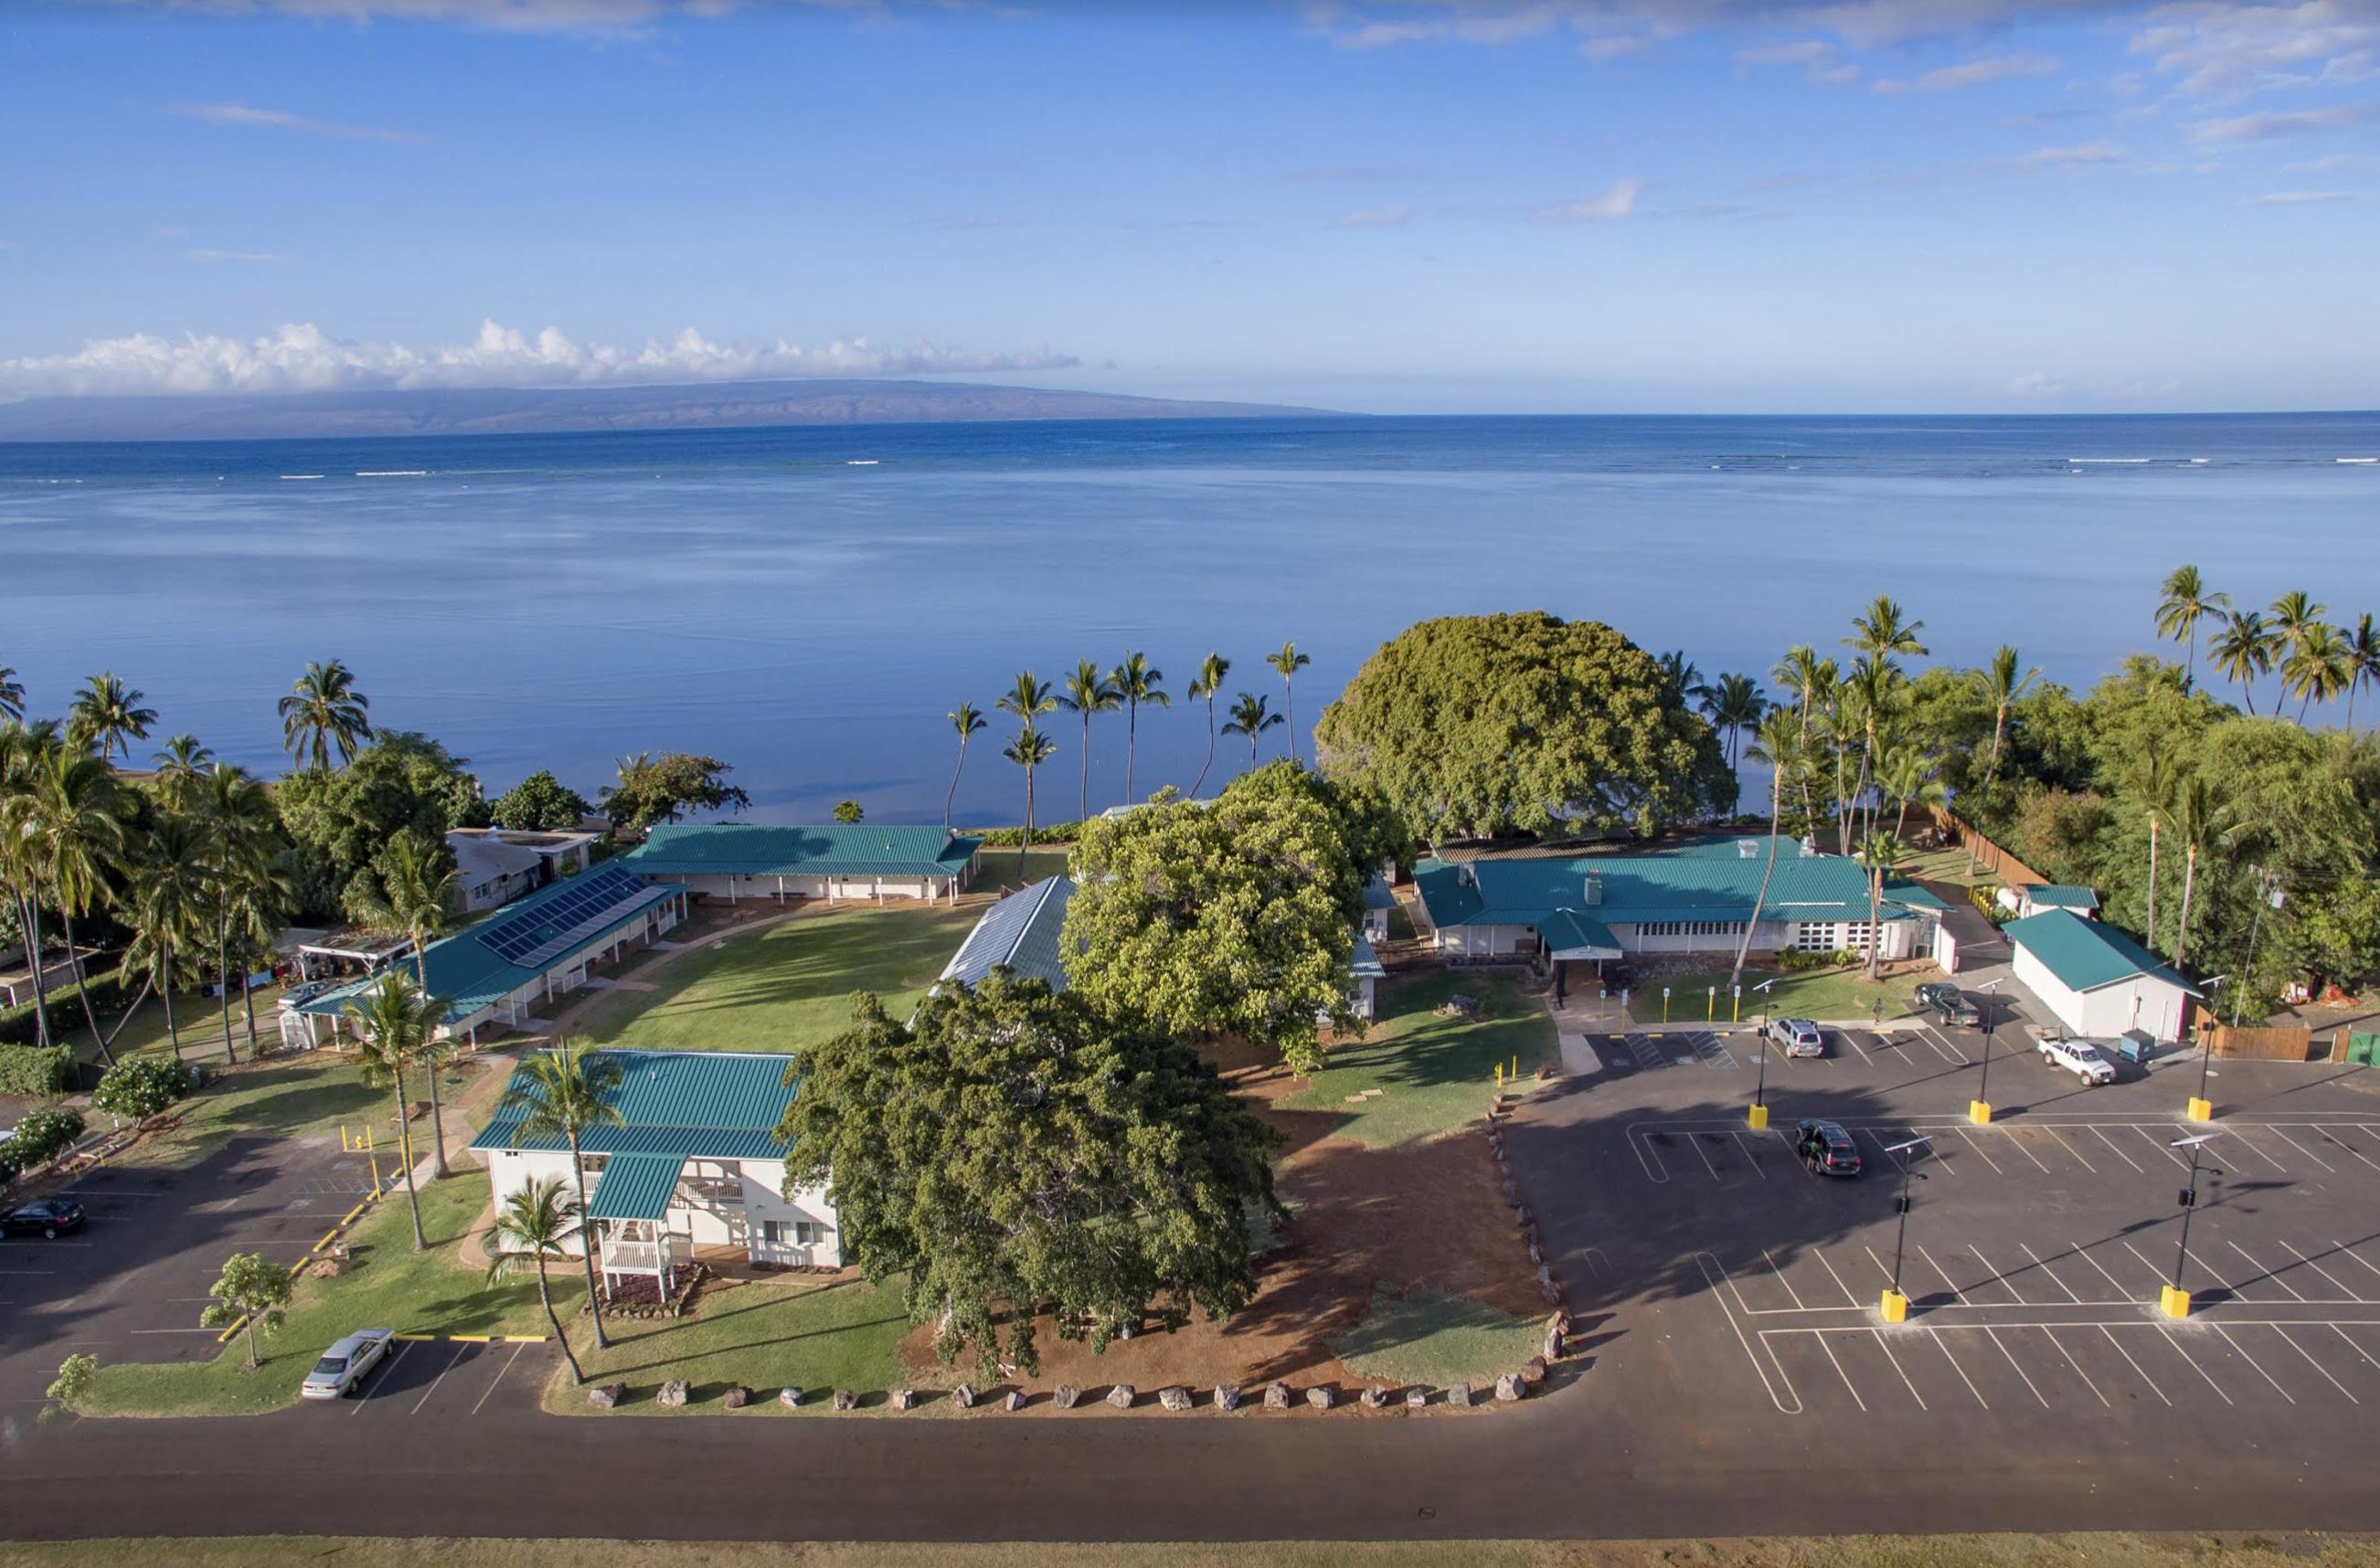 Monoclonal Antibody Therapy Offered on Both Moloka'i and Maui